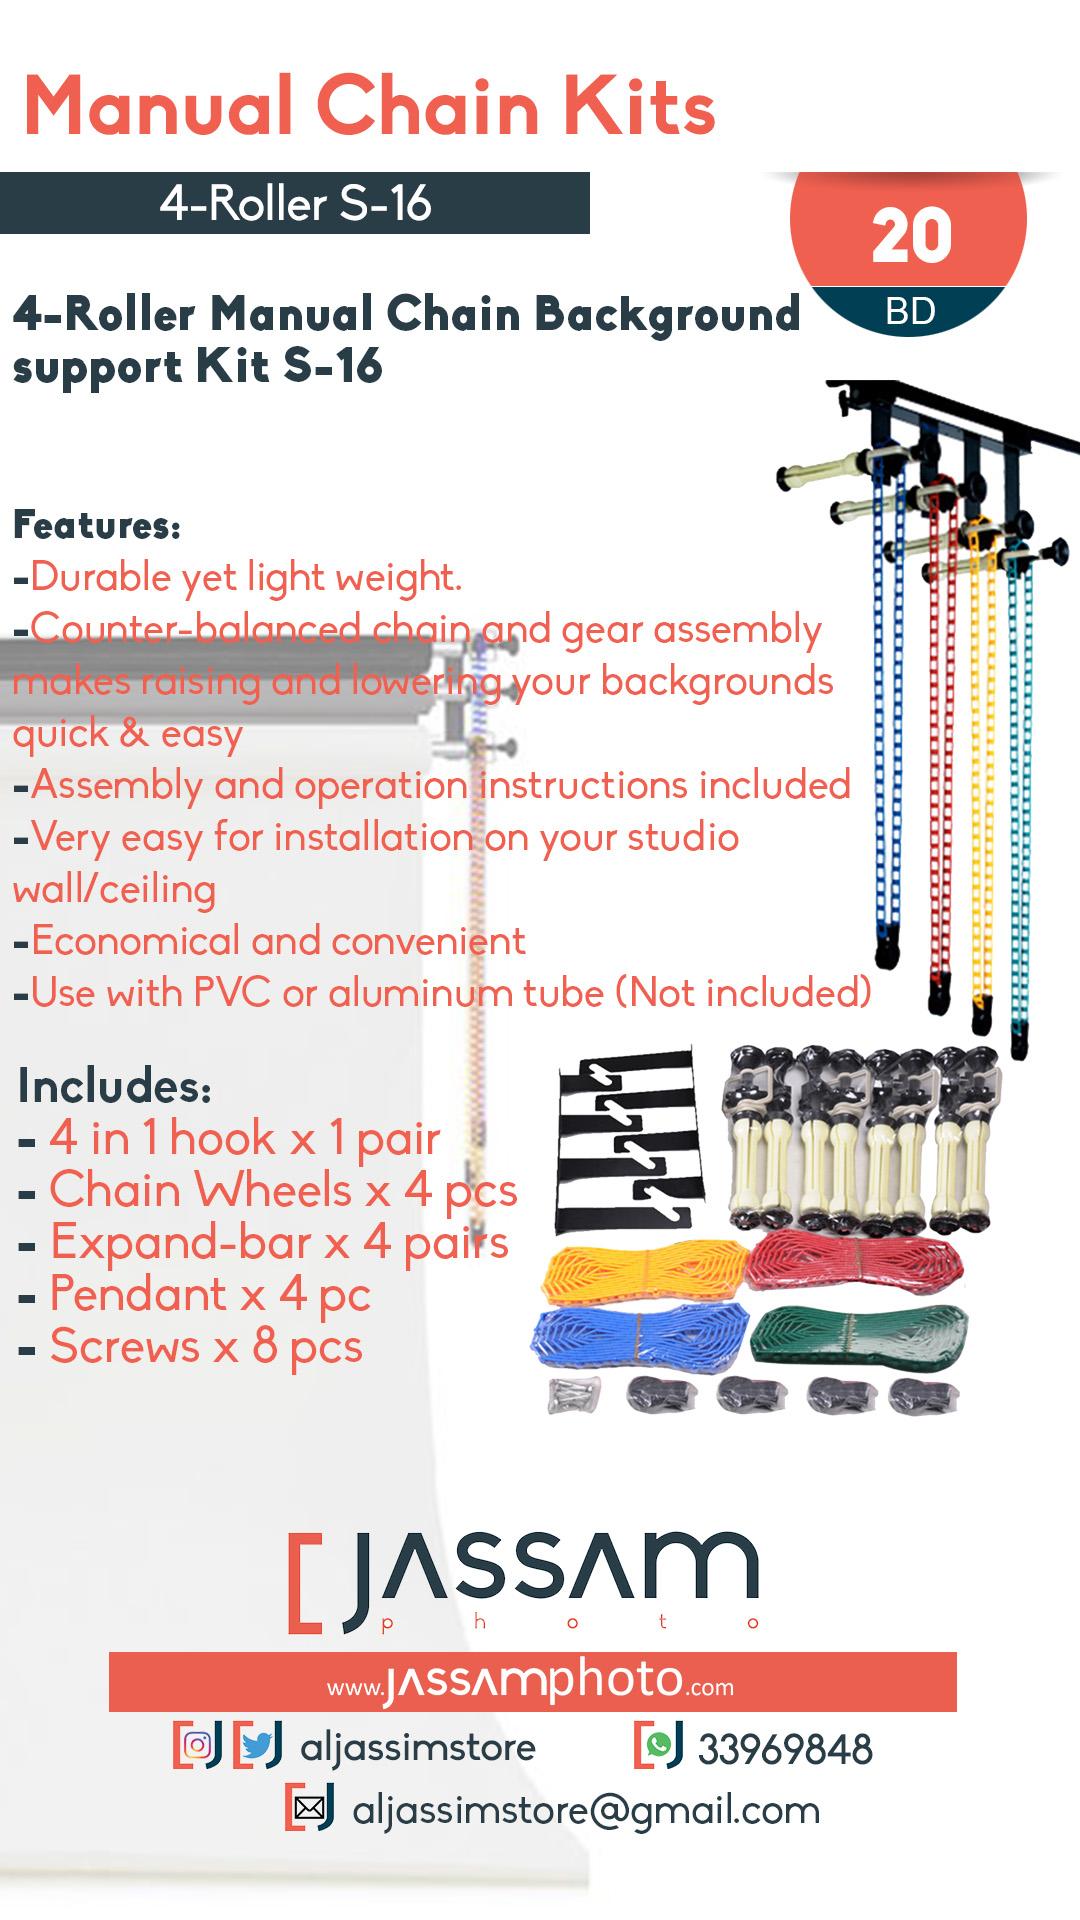 4-Roller Manual Chain Kit S-16